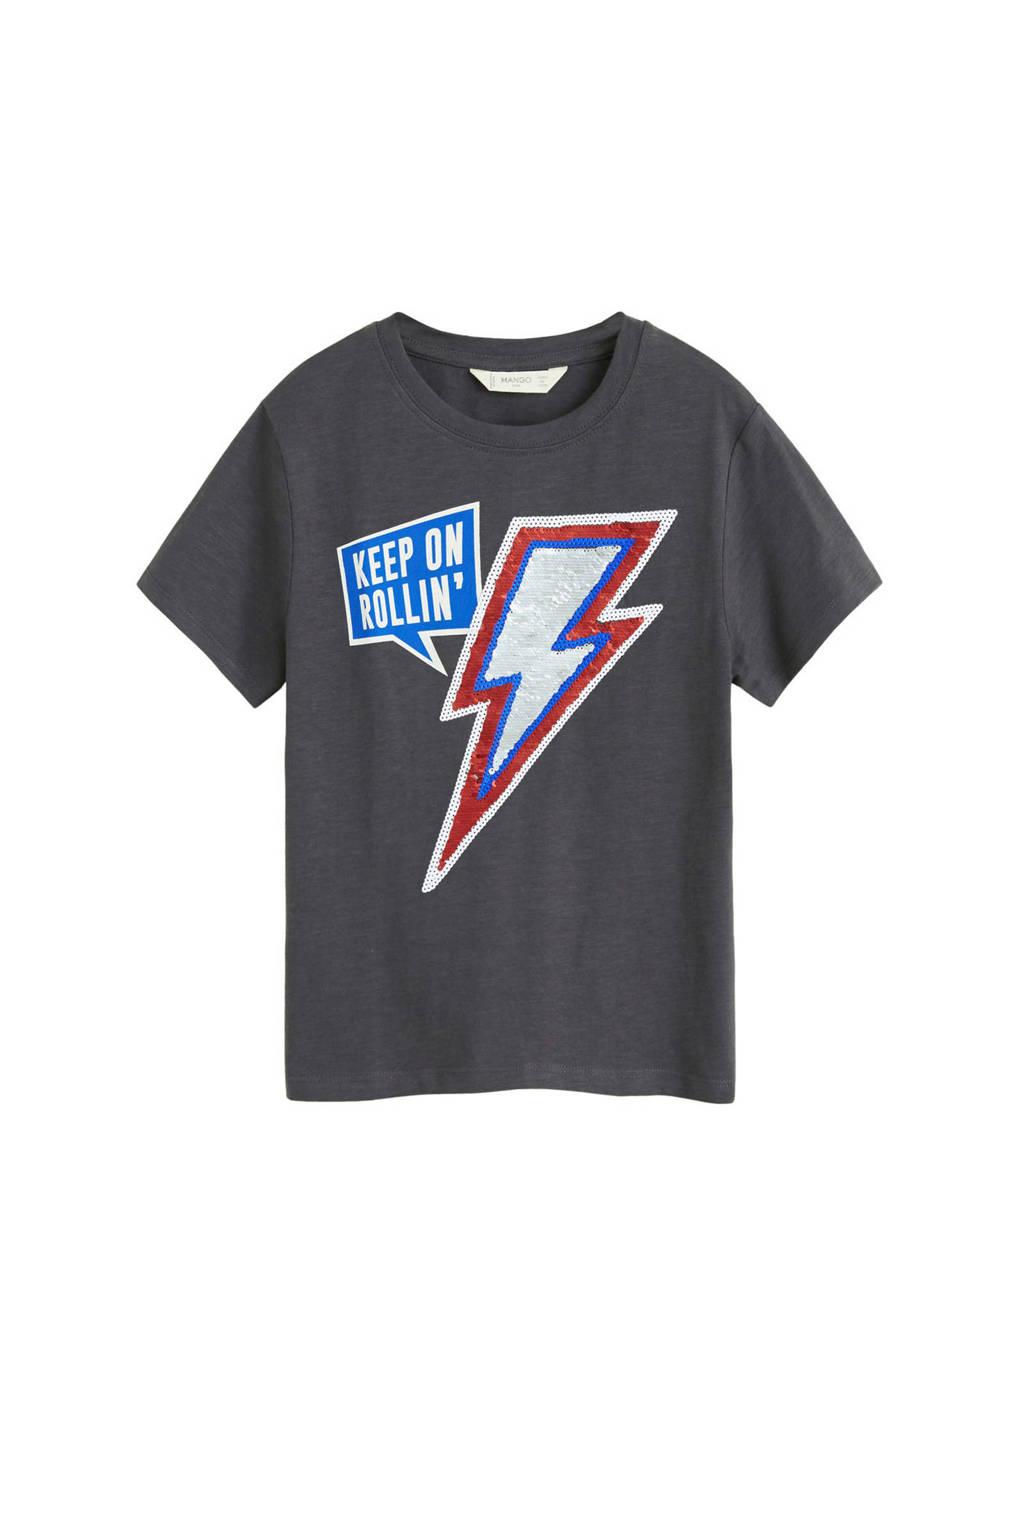 Mango Kids T-shirt met tekst en pailletten grijs, Donkergrijs